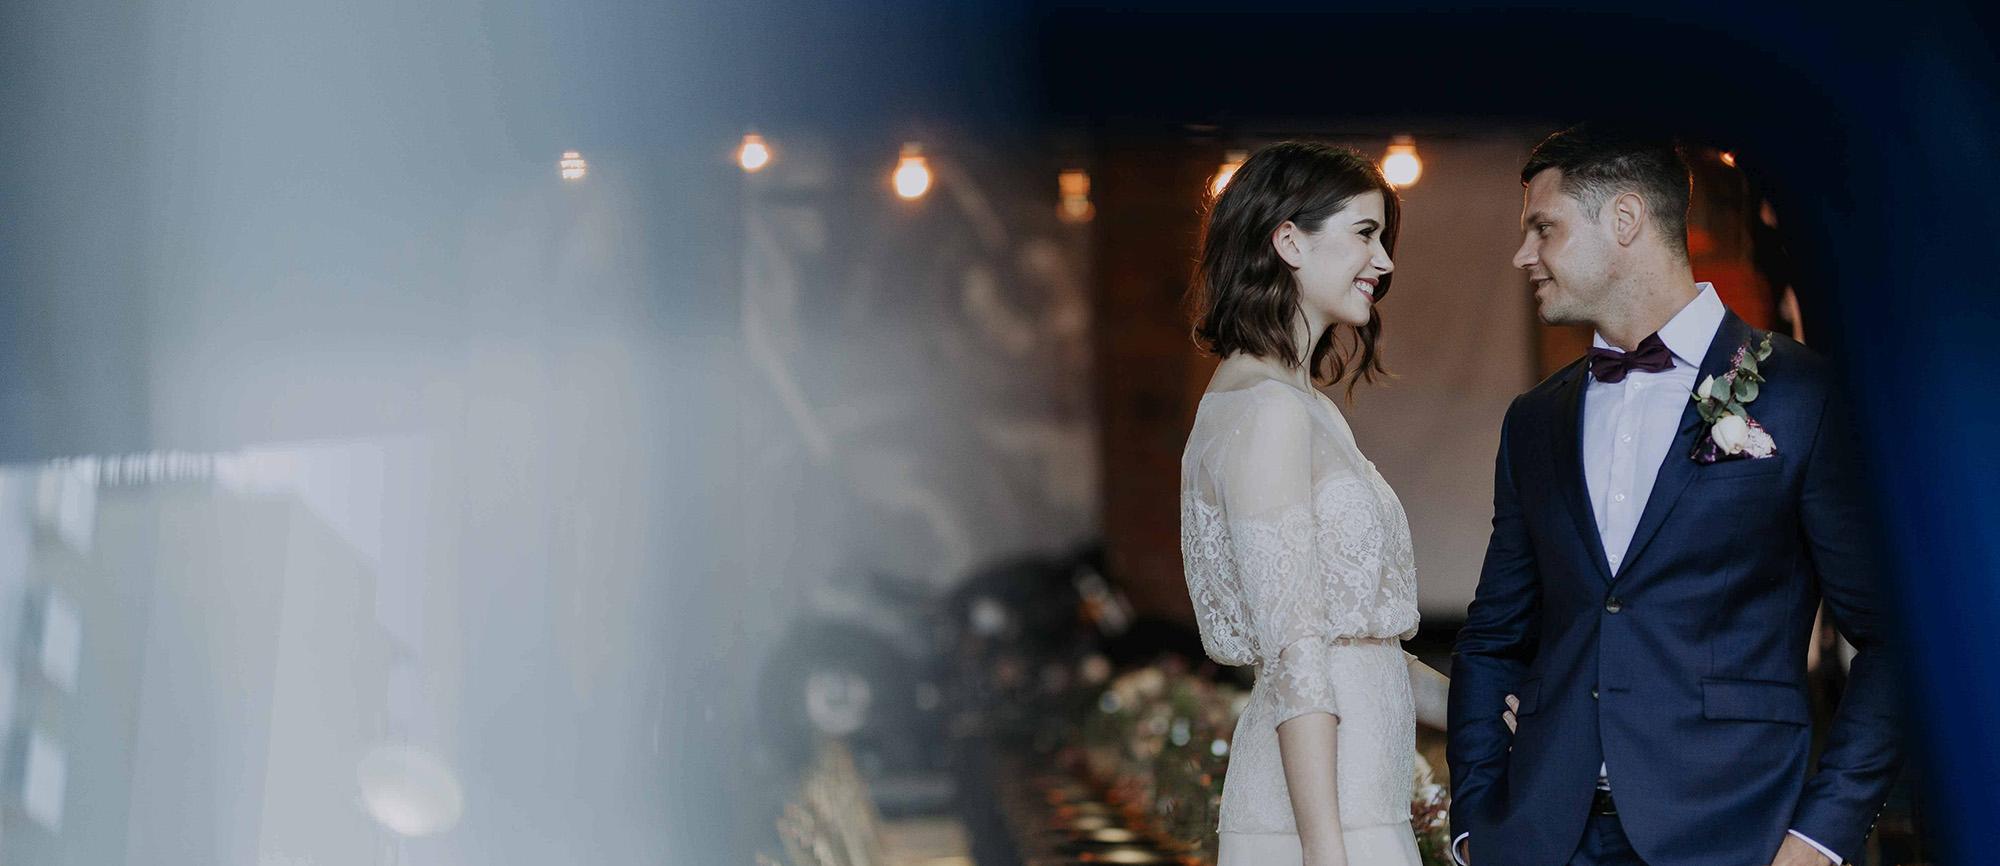 Smoked Garage Brisbane Weddings & Events